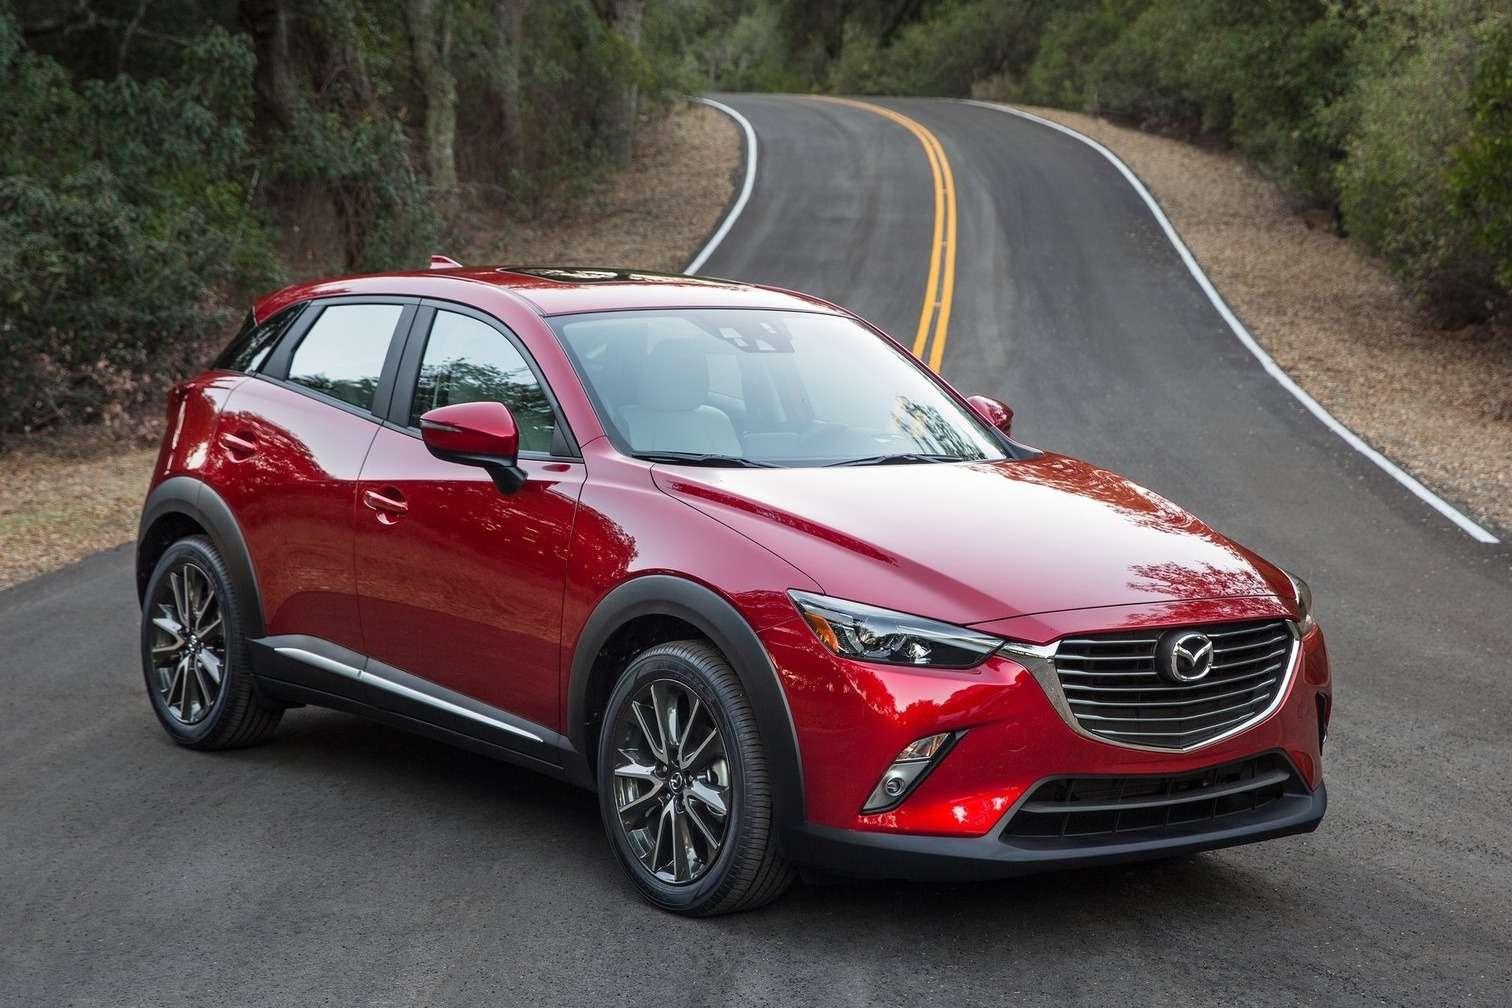 Mazda-CX-3_2016_1600x1200_wallpaper_04